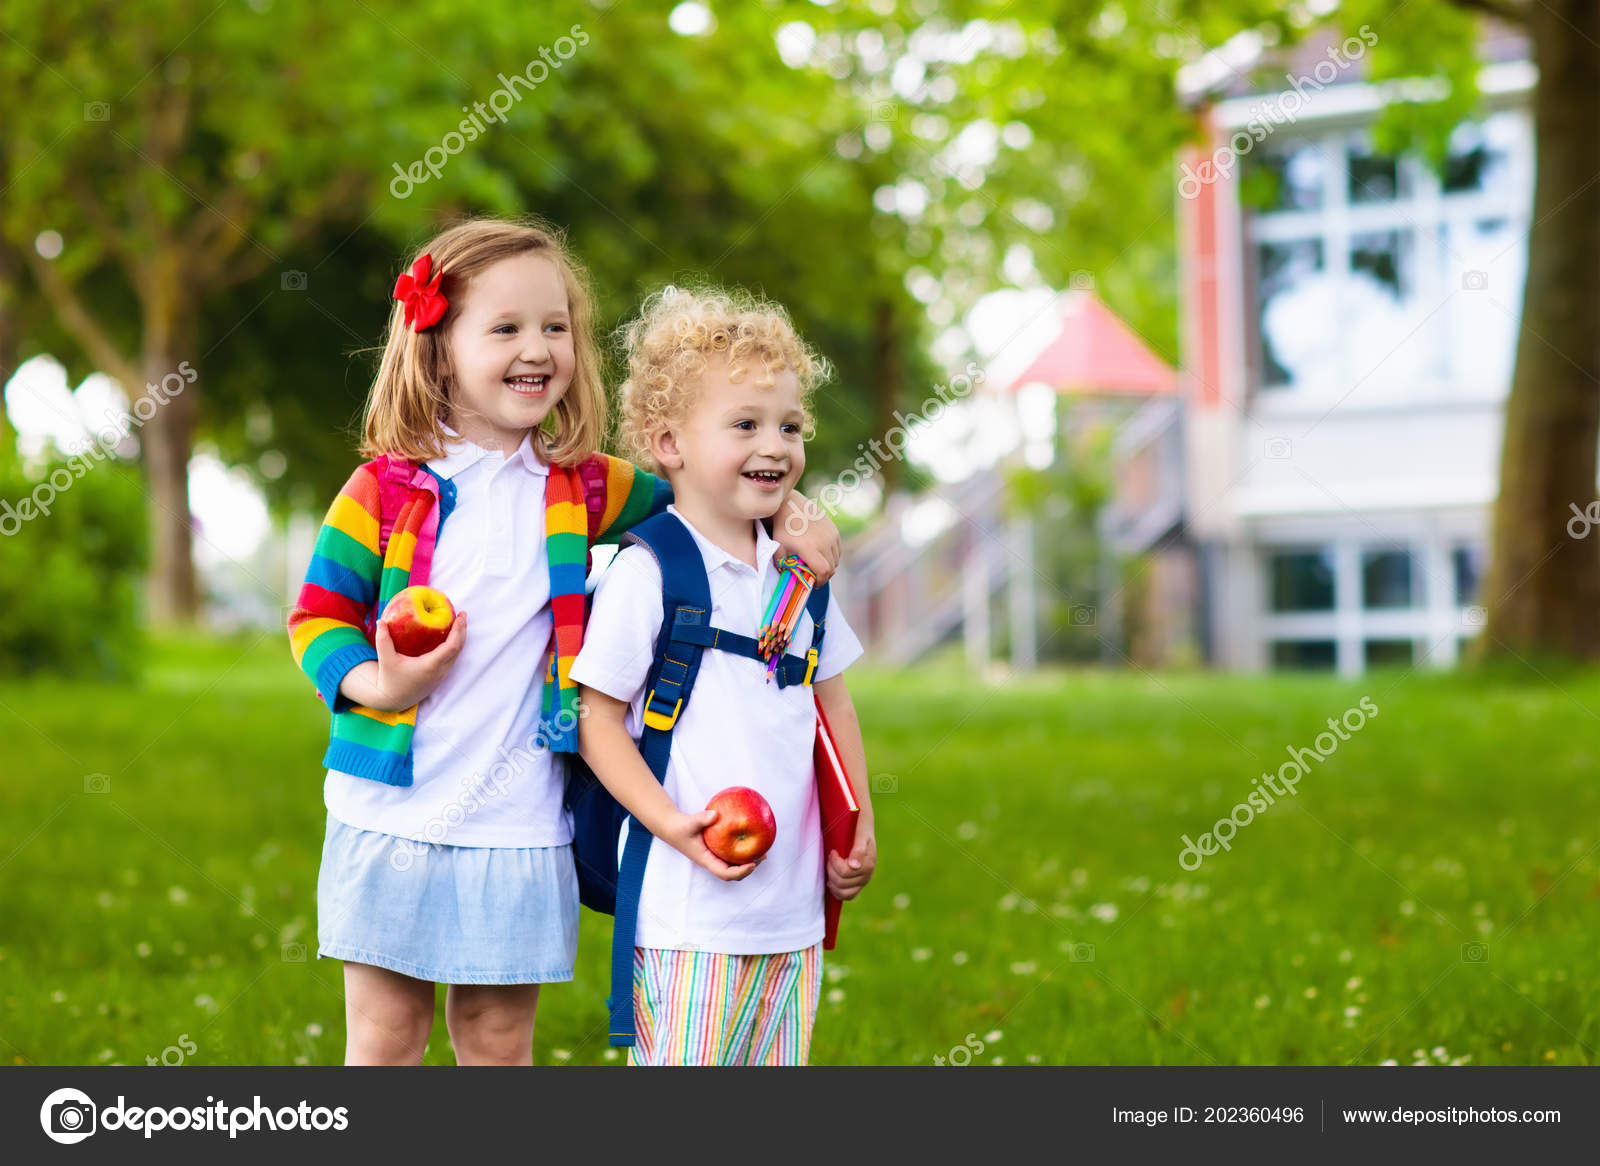 47e79d1f875 Παιδί Που Πηγαίνουν Στο Σχολείο Αγόρι Και Κορίτσι Κρατώντας Βιβλία ...